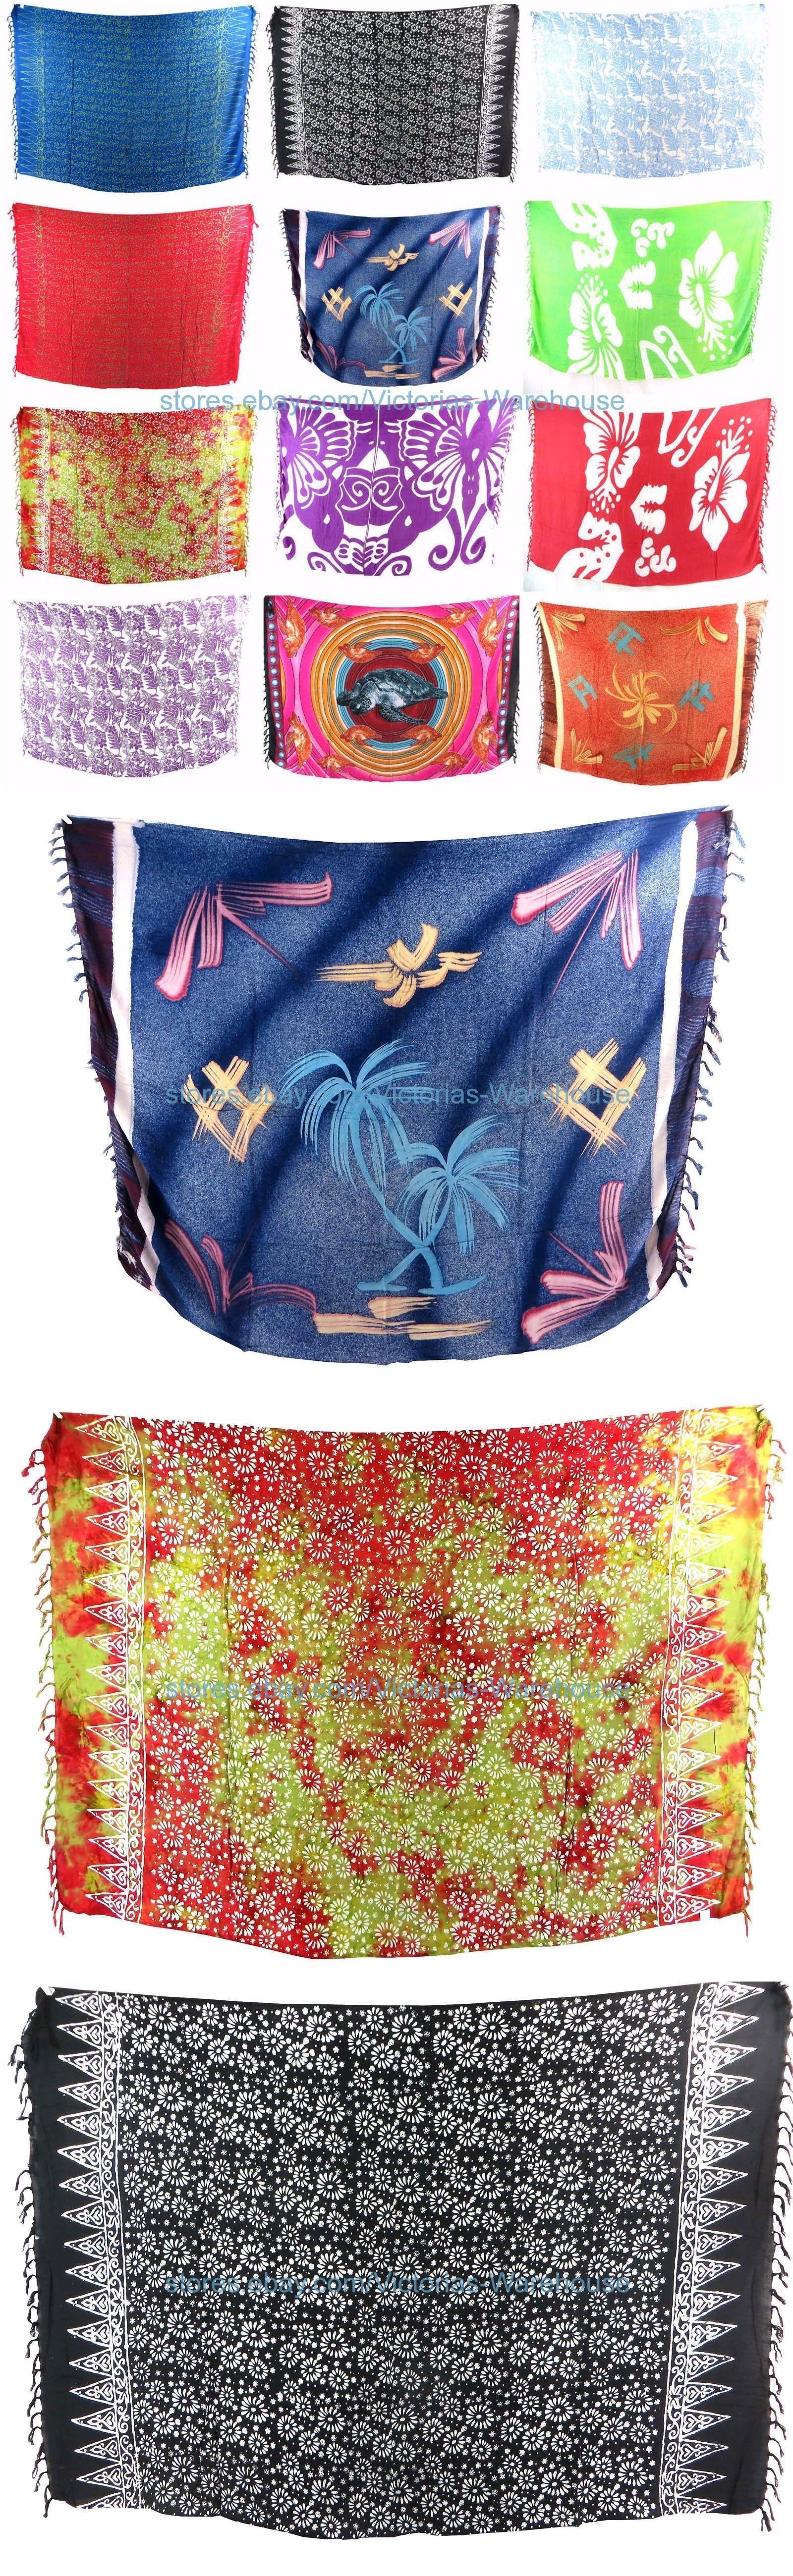 Swimwear 50994 10pcs sarong hibiscus hawaiian flowers butterflies objevte npady na tma letn obleen swimwear 50994 10pcs sarong hibiscus hawaiian flowers butterflies wholesale izmirmasajfo